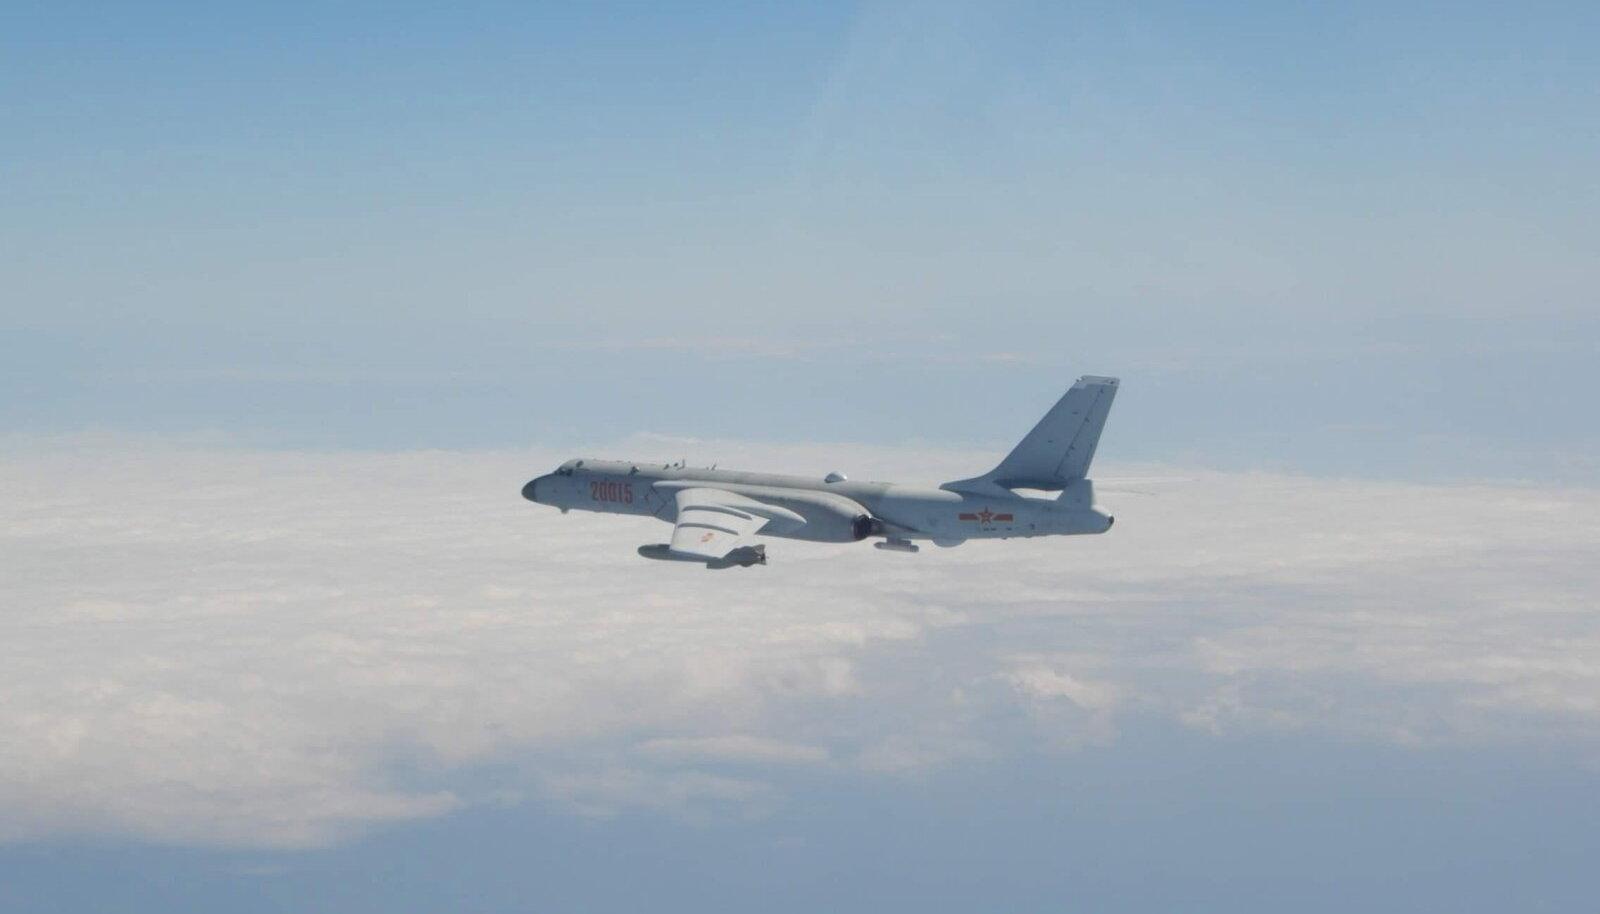 Hiina pommitaja Xian H-6